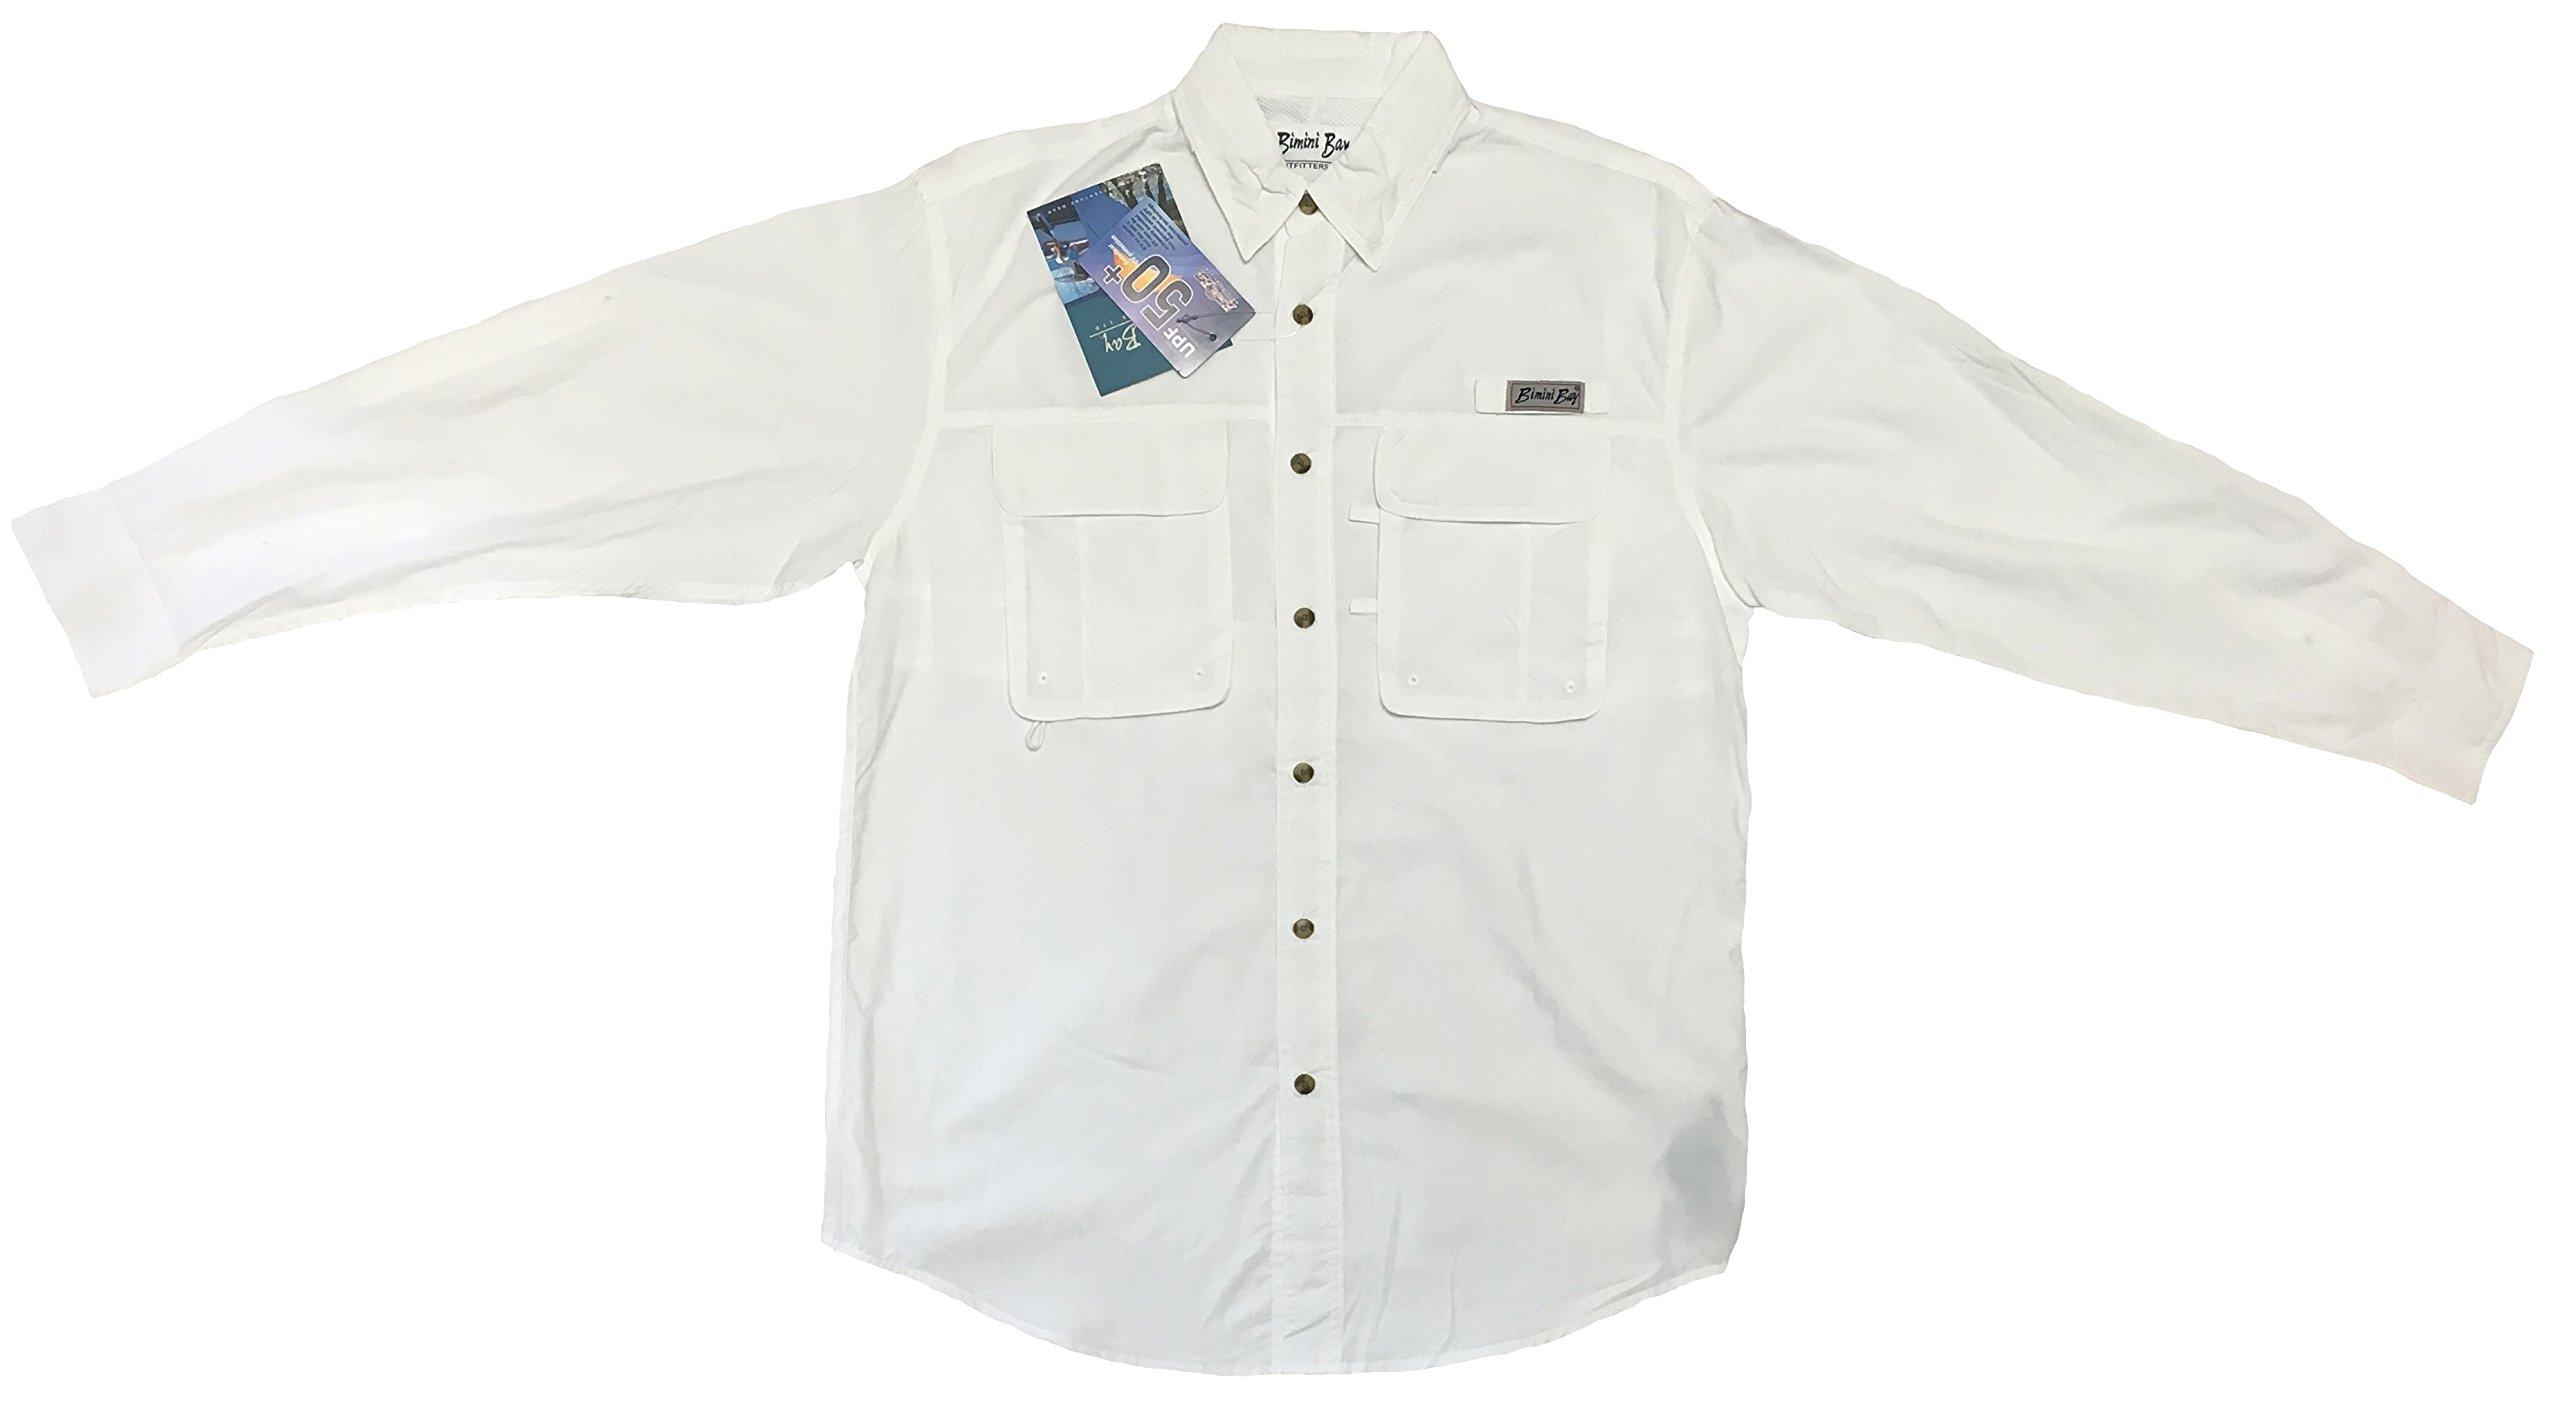 Bimini Bay Outfitters Men's Bimini Flats III Quick Dri Long Sleeve Shirt (2-Pack) (XXX-Large, White) by Bimini Bay Outfitters